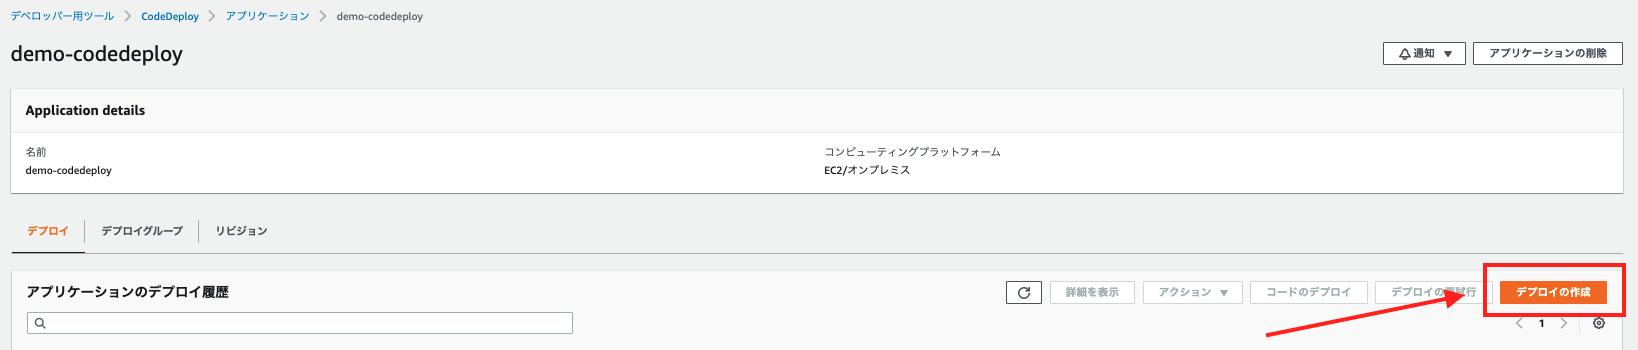 https://cdn-ssl-devio-img.classmethod.jp/wp-content/uploads/2021/06/8638869f264d0746a66967c4f3dd1558.png